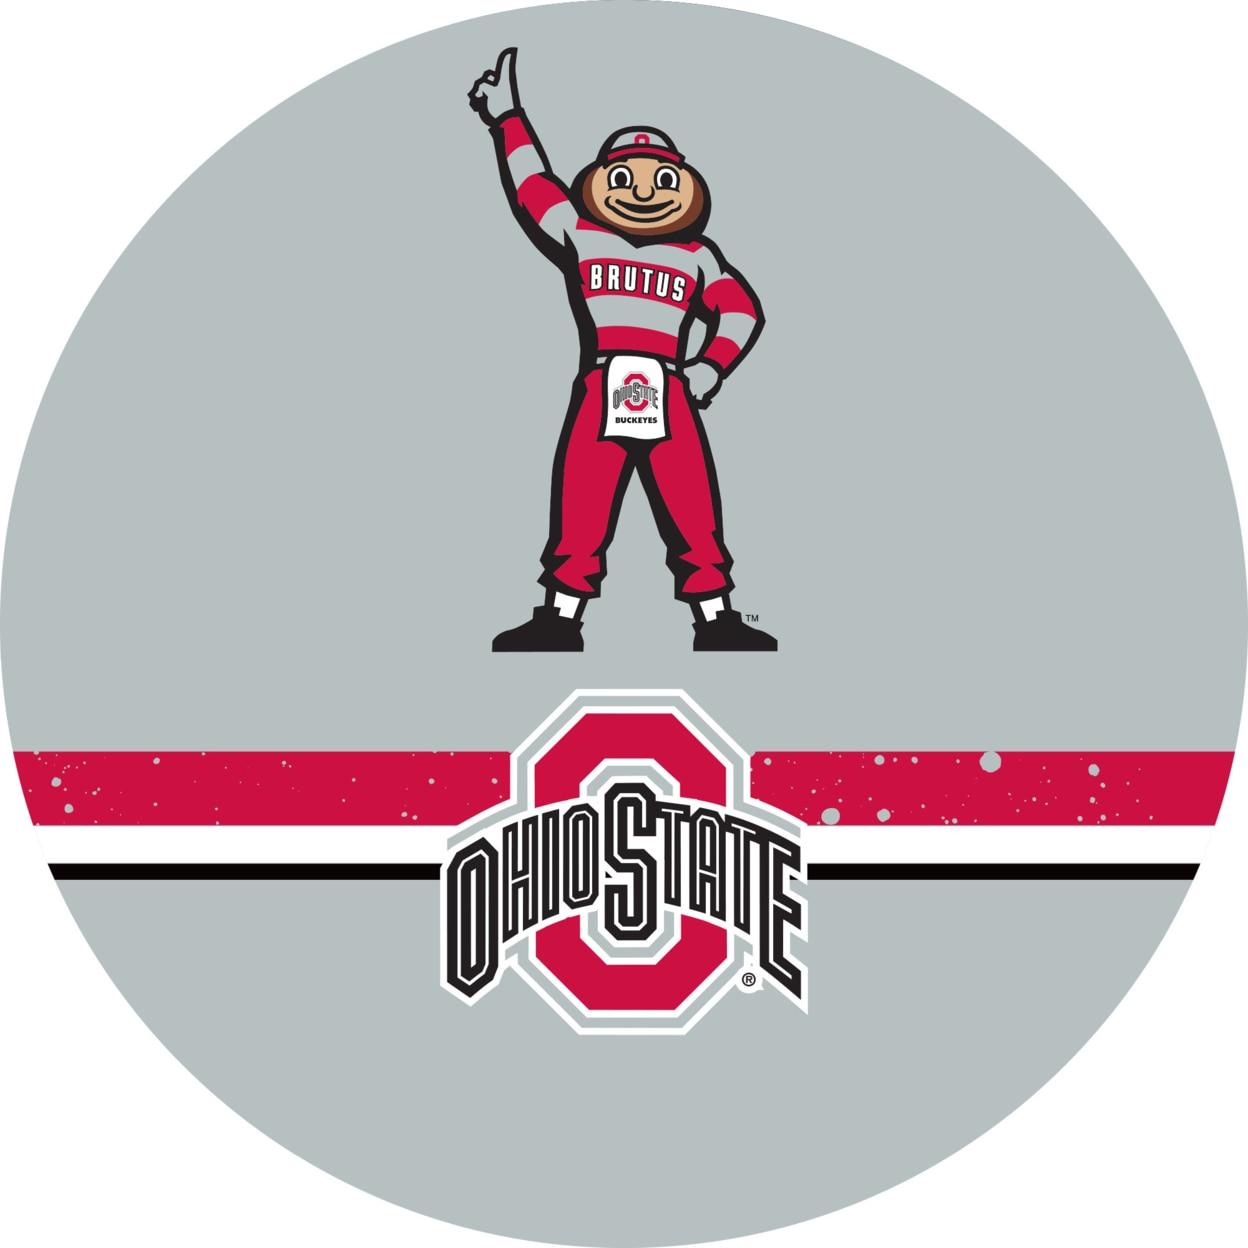 Ohio State Stripe Brutus Chrome 42 Inch Pub Table ботинки meindl meindl ohio 2 gtx® женские